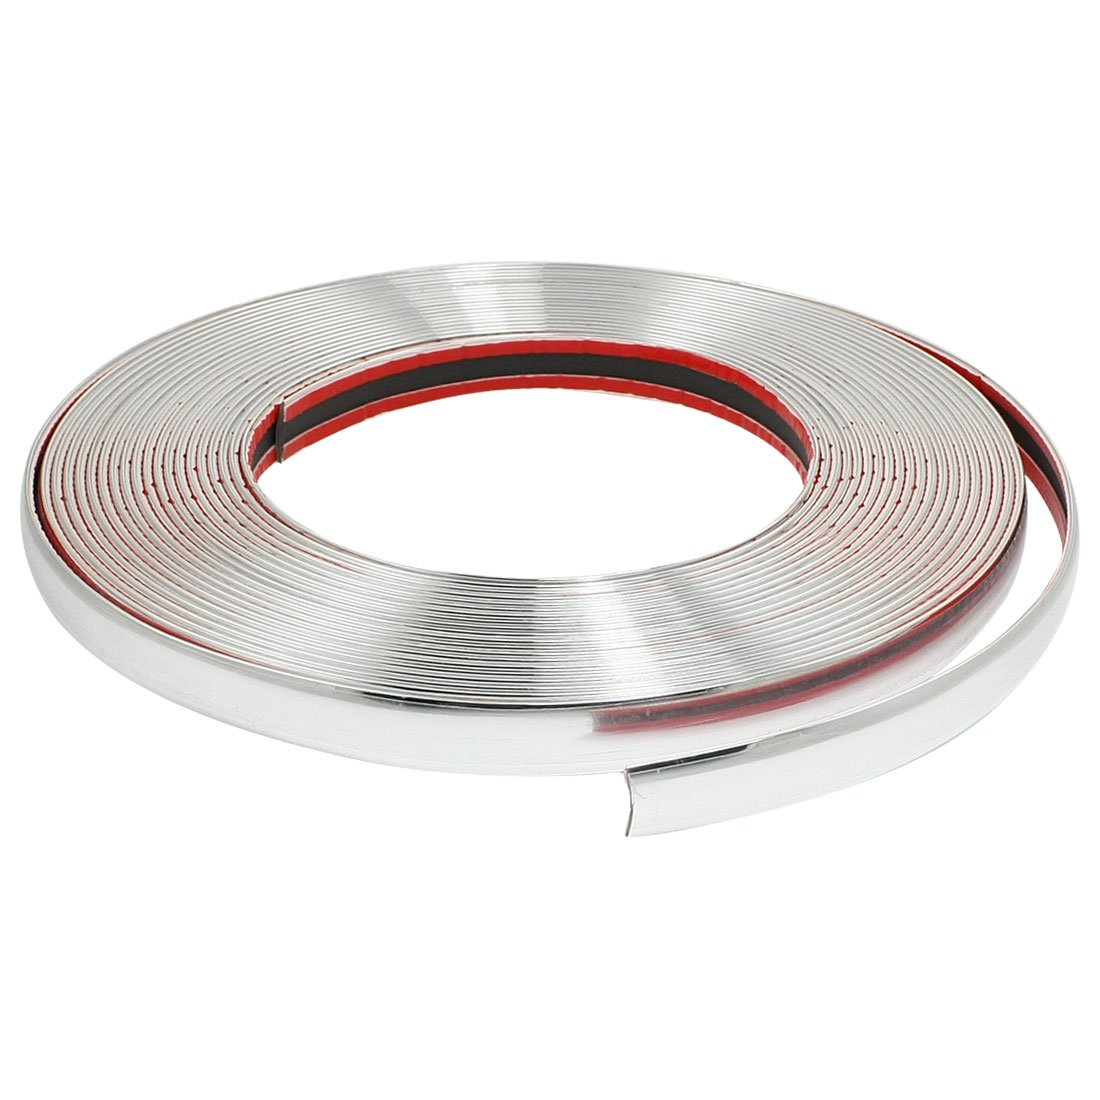 uxcell® Car Decorative Chrome Moulding Trim Strip Silver Tone 15M x 10mm